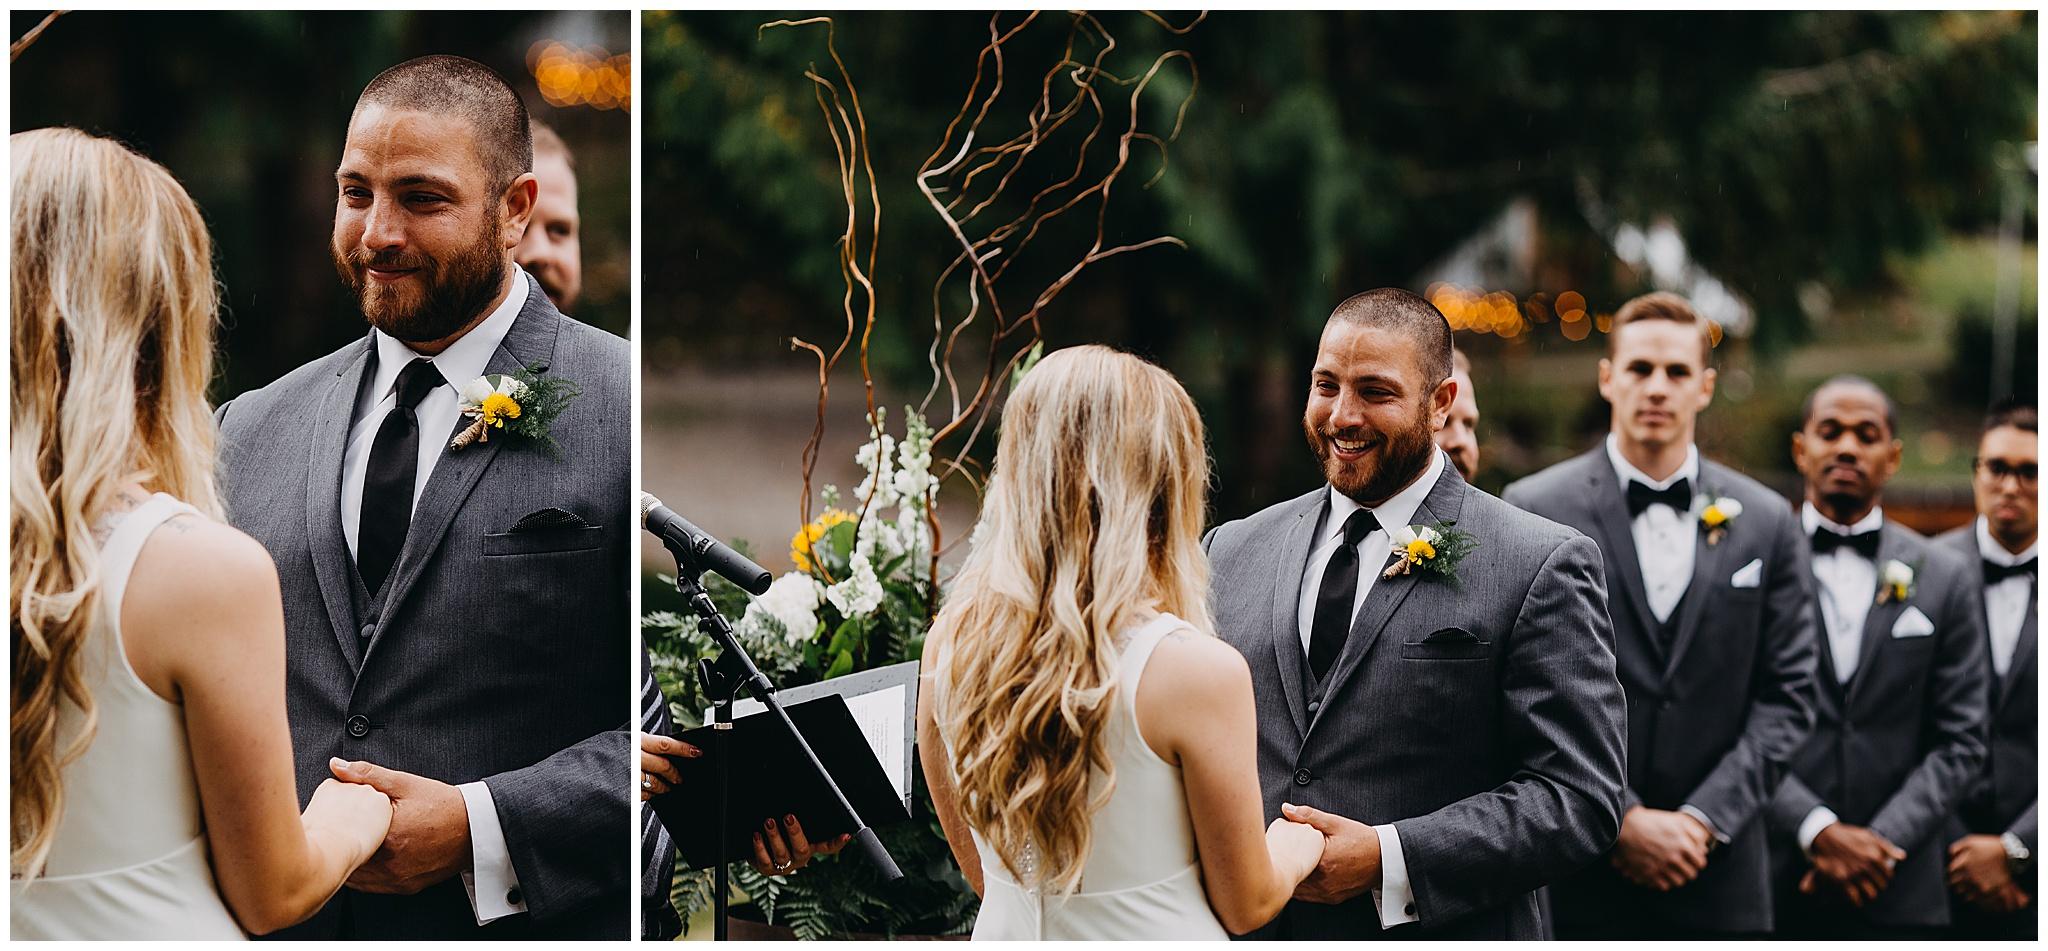 index-wa-wedding47.jpg